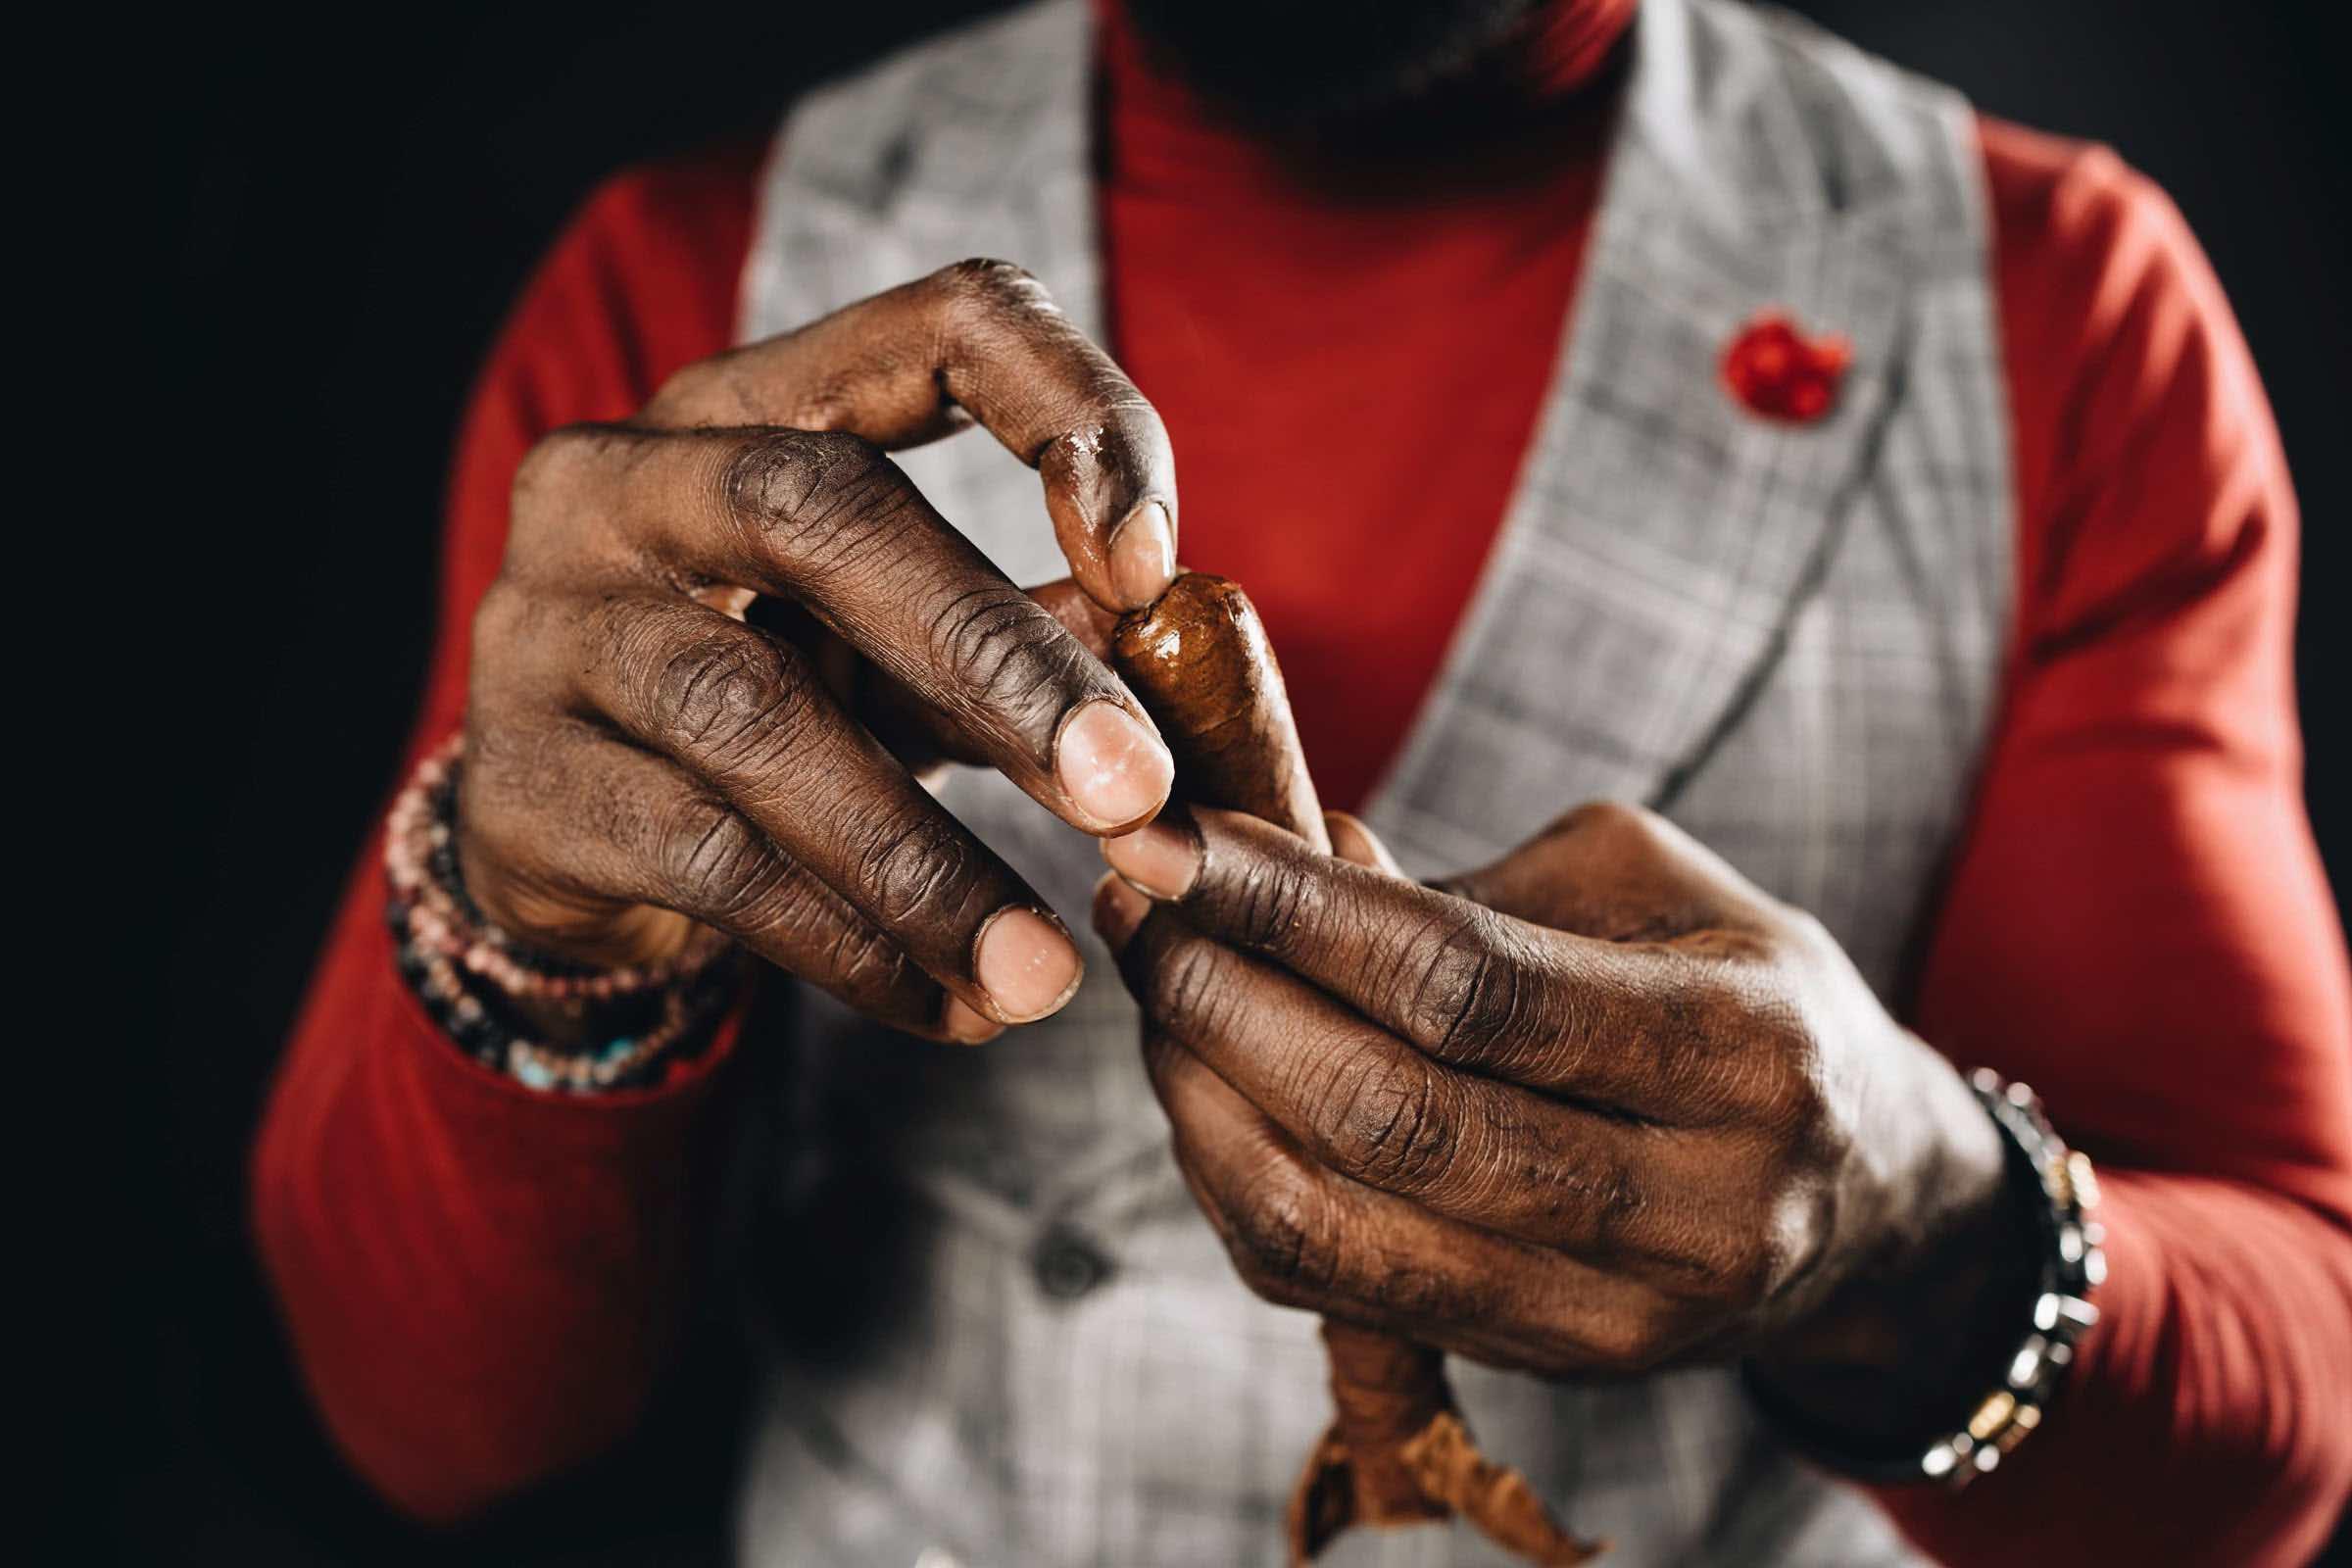 Zigarrendreher | Hamburg | Zigarrenroller | Zigarrenrollerin | Trocadero | Kaufen | Buchen | Mieten | Handgemacht | Zigarren | Zigarrenkleber | Churchill | Robusto | Corona | Robusto | Banderole | Bauchbinde | drehen | Tabak | Cuba